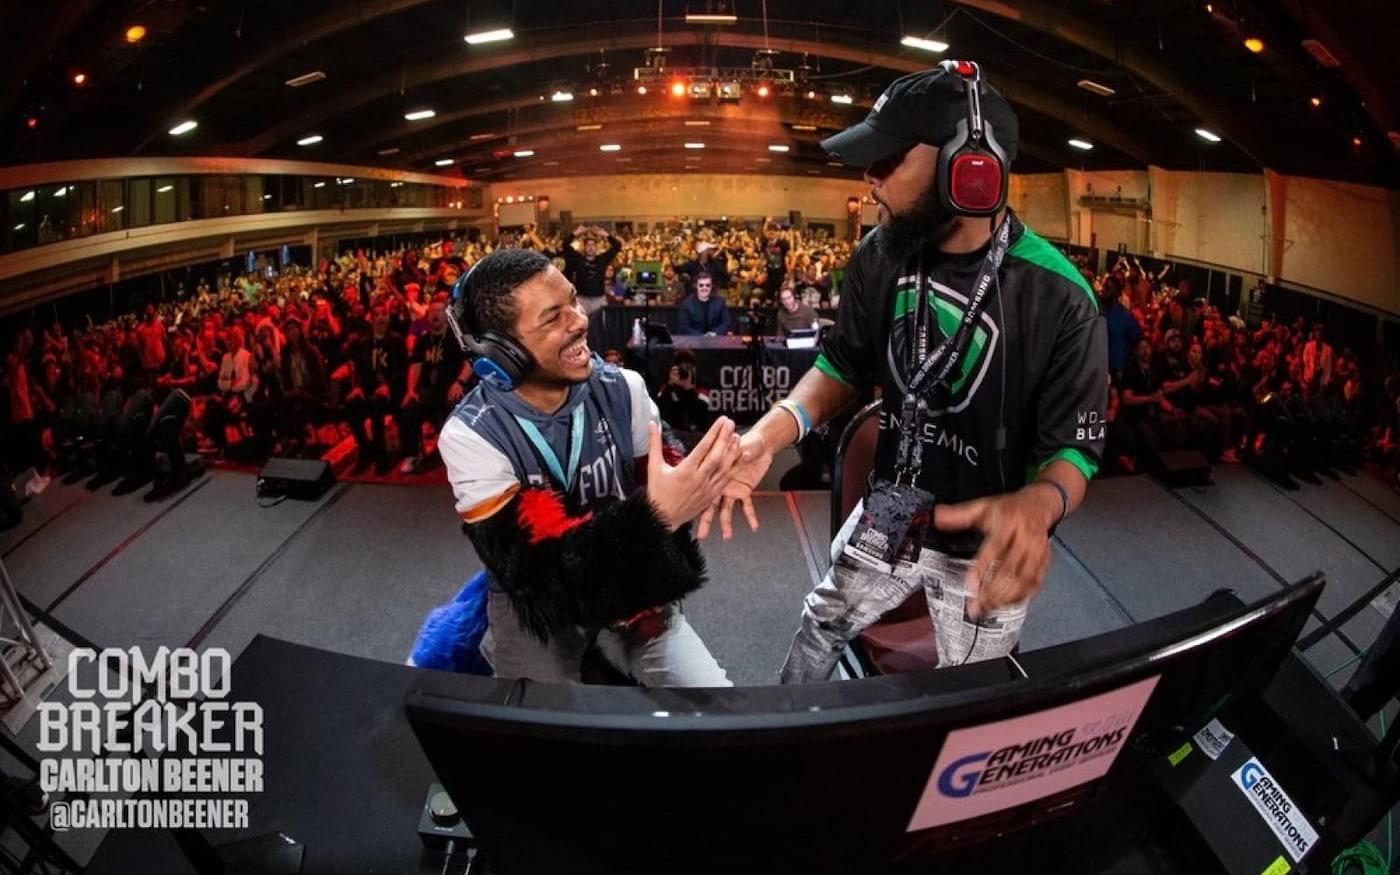 Combo Breaker 2019: Scar vence SonicFox e é campeão no Mortal Kombat 11